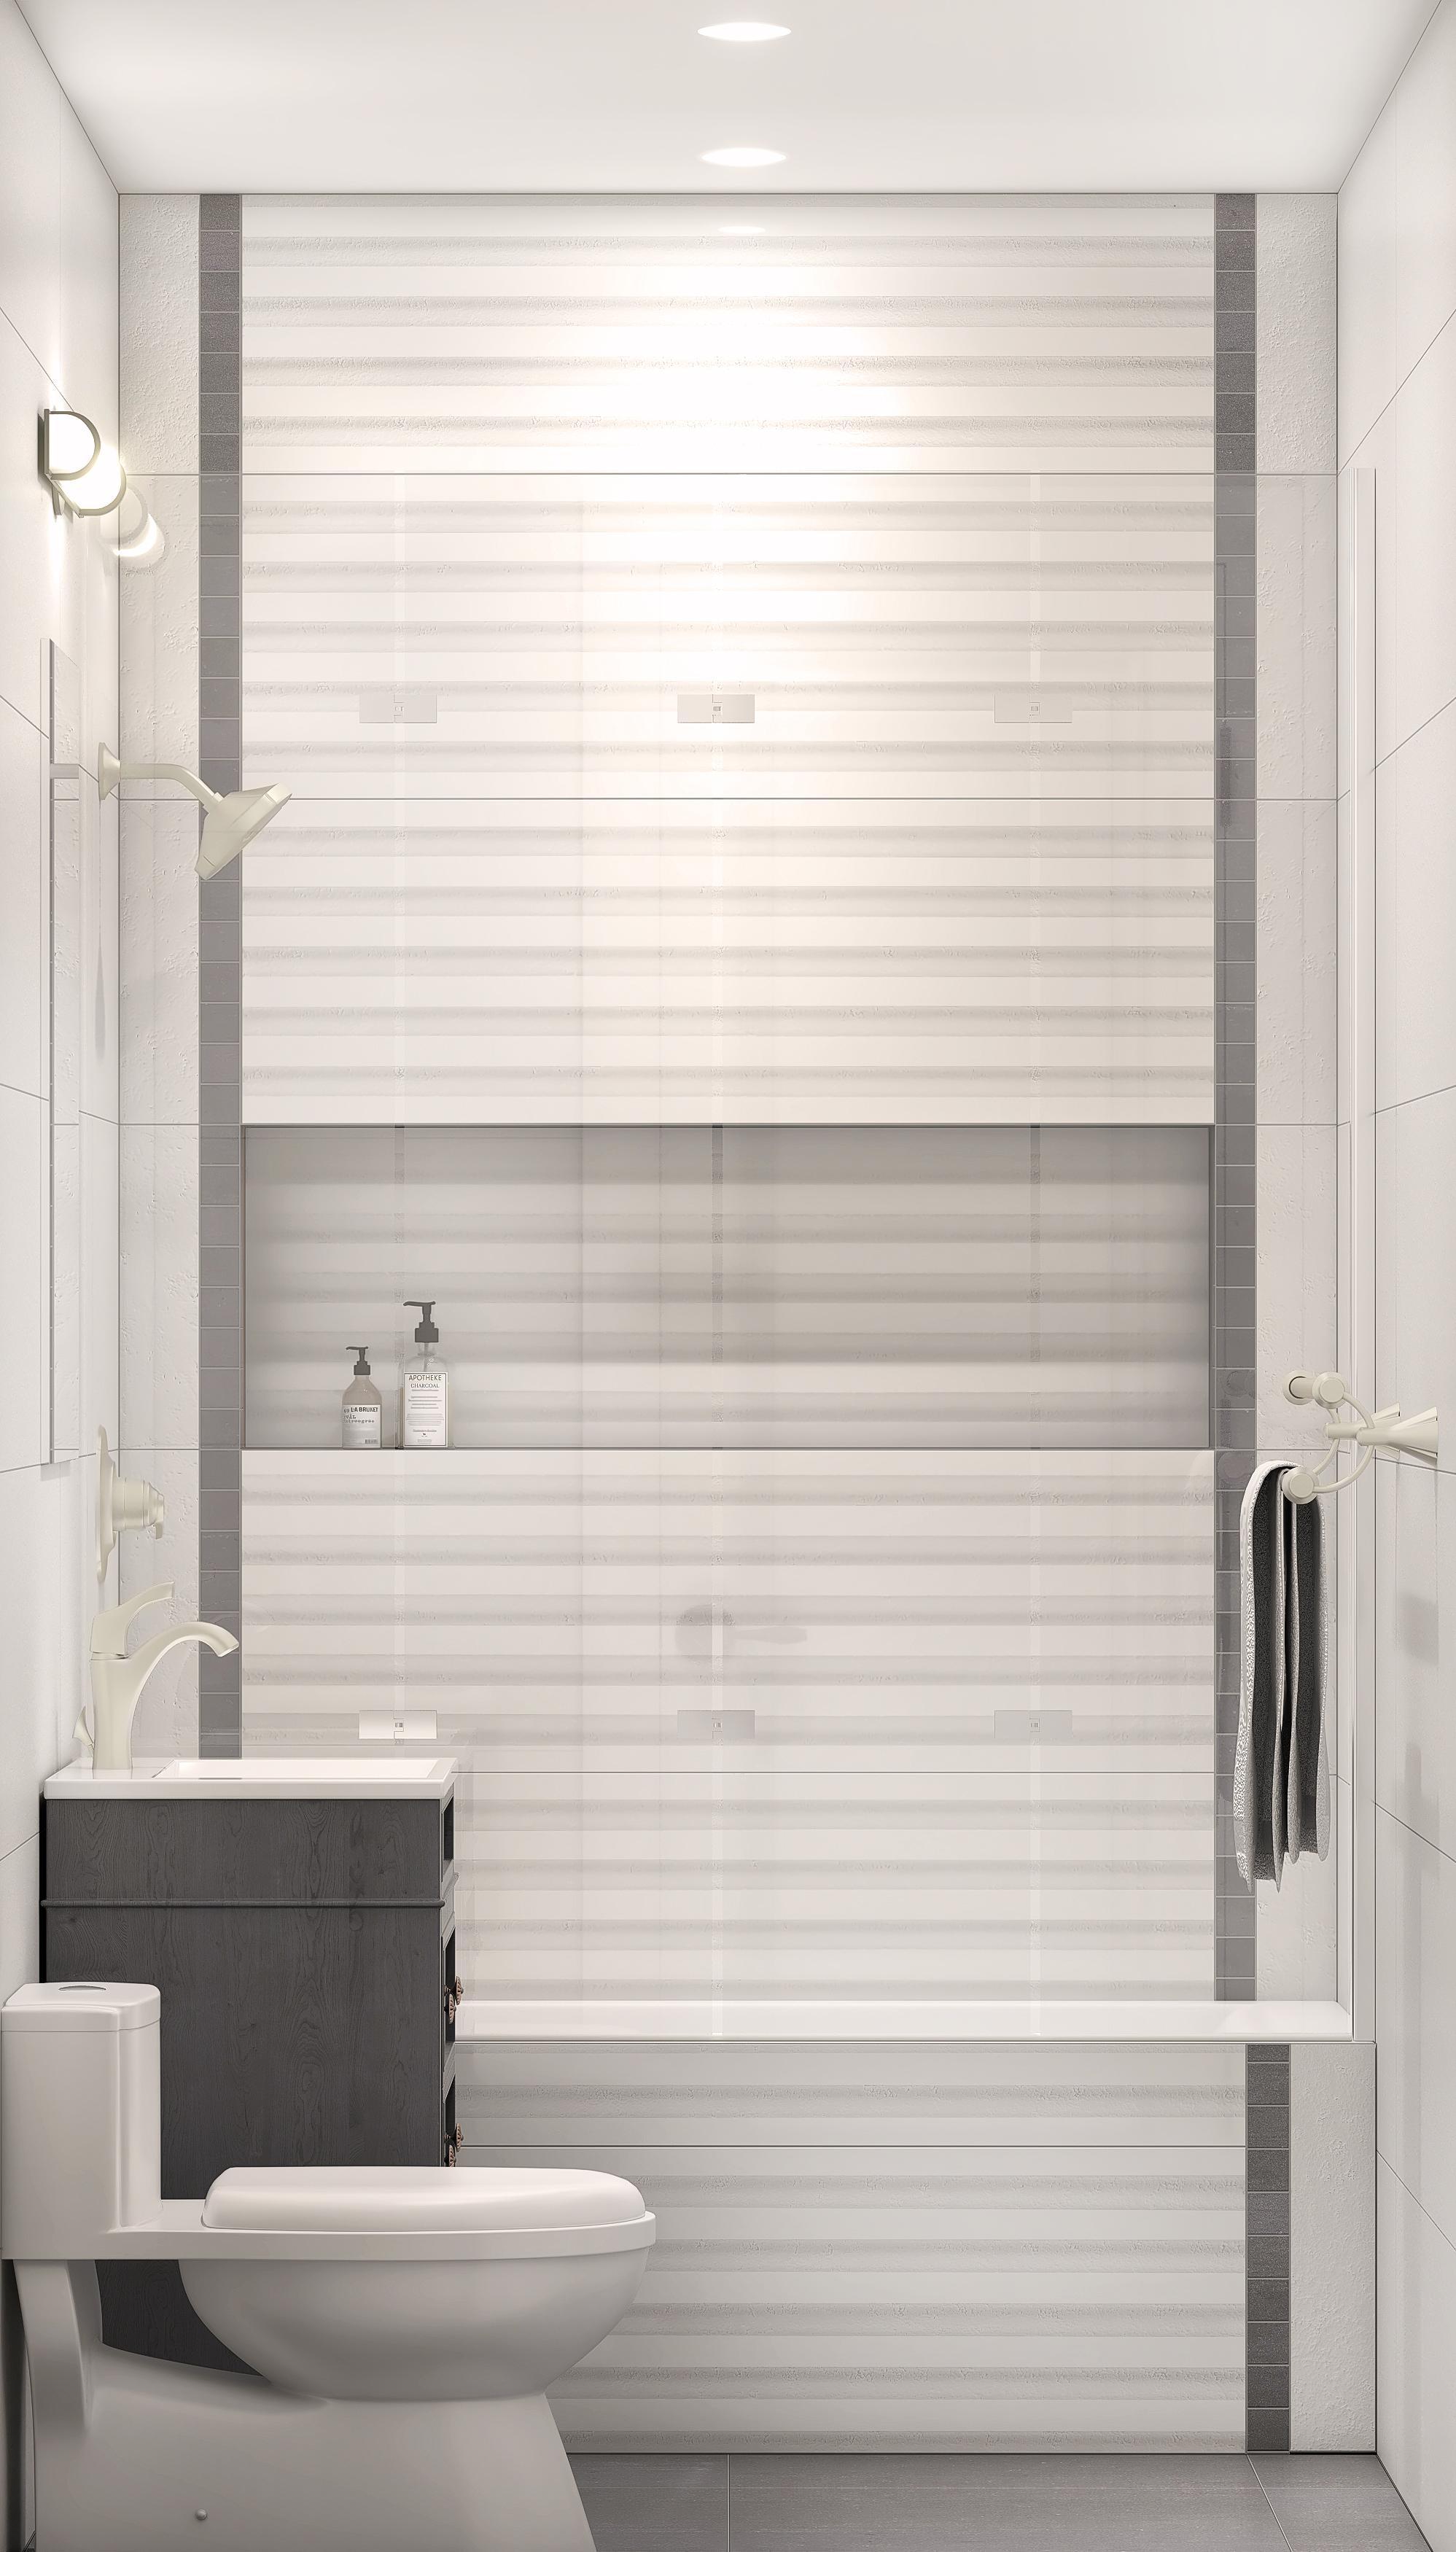 11-bathroom-85-01.0004-300 dpi-edit.jpg